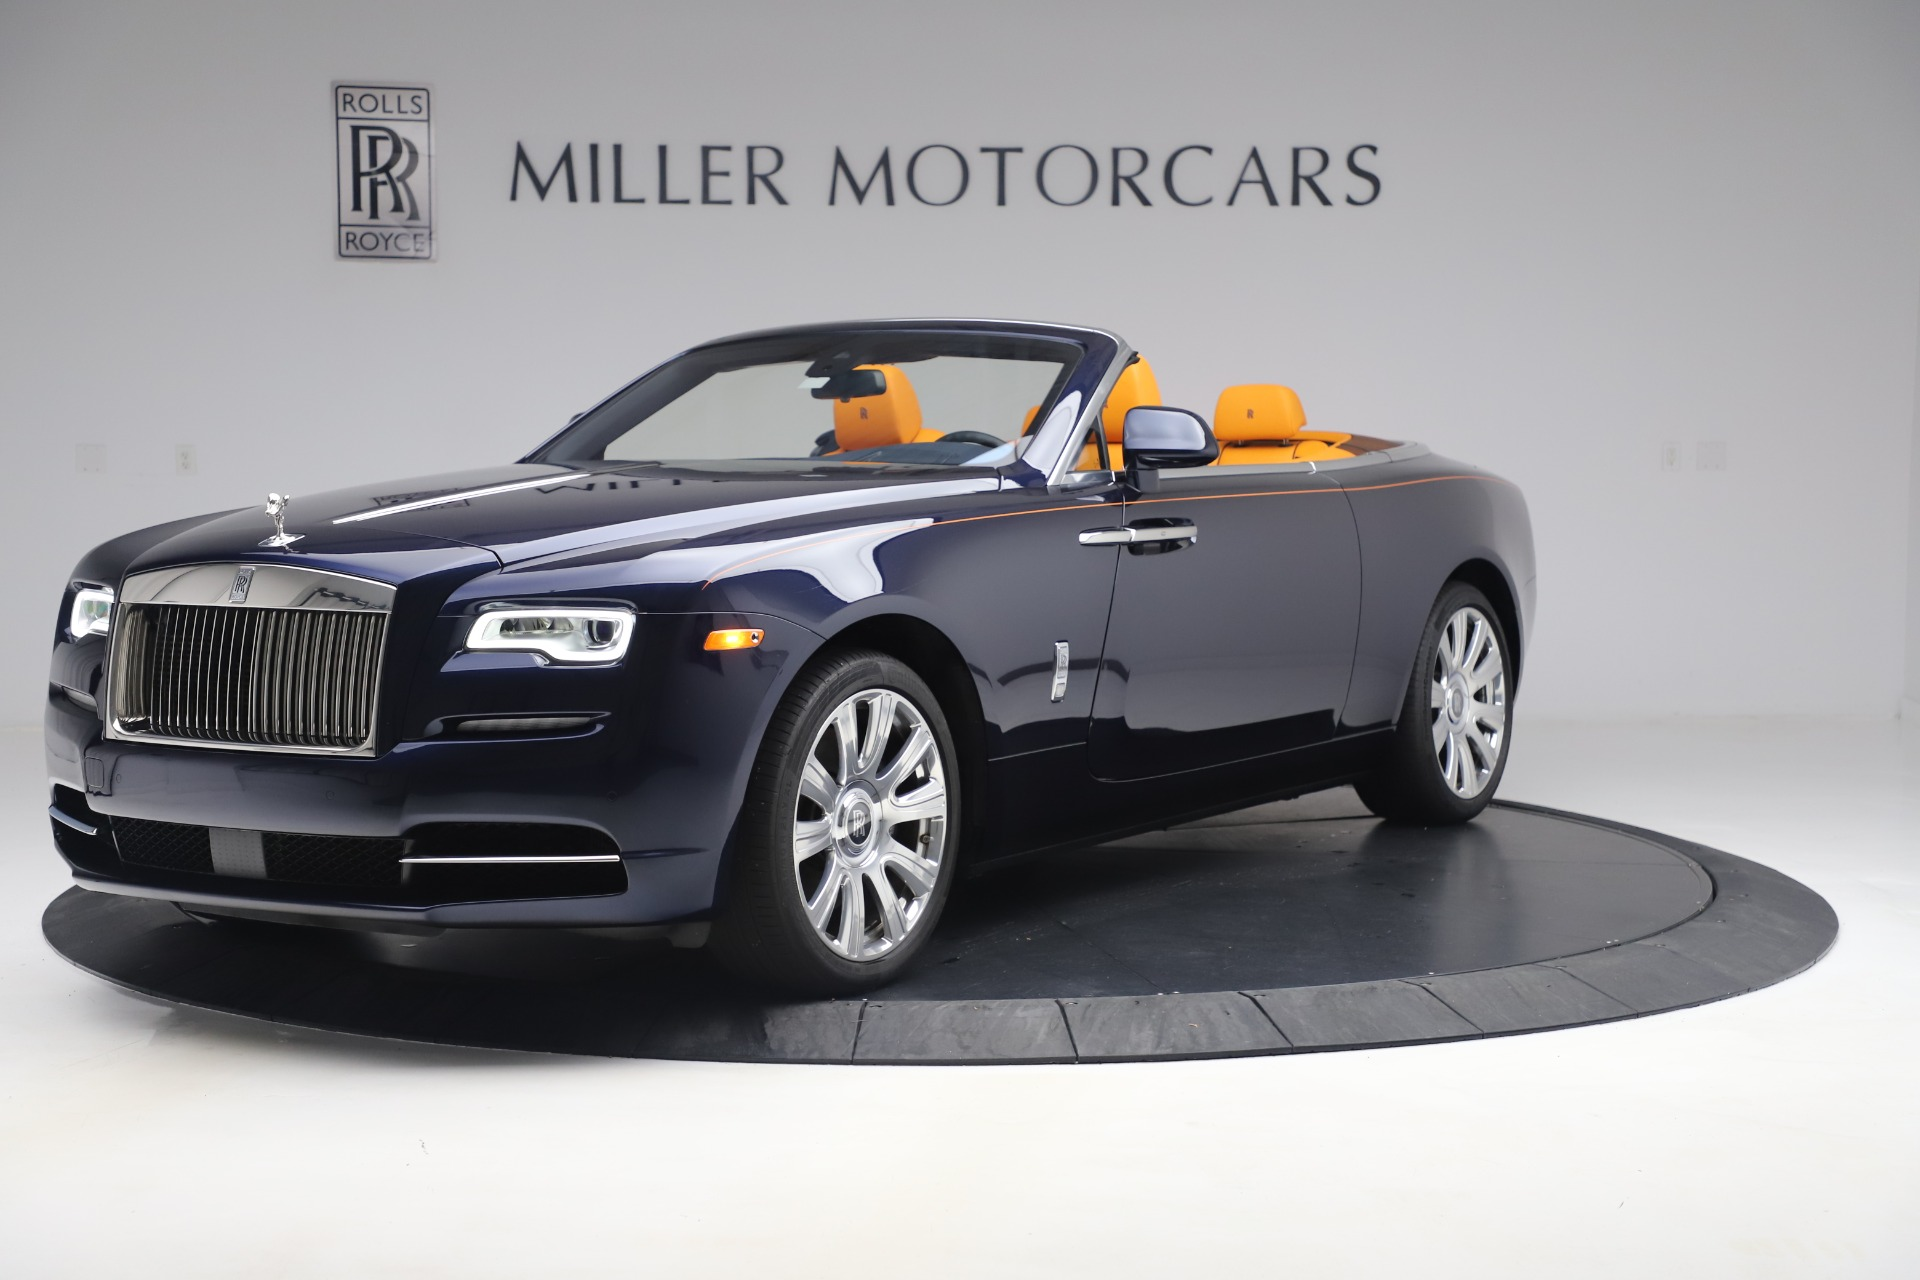 Used 2017 Rolls-Royce Dawn for sale $249,900 at Rolls-Royce Motor Cars Greenwich in Greenwich CT 06830 1